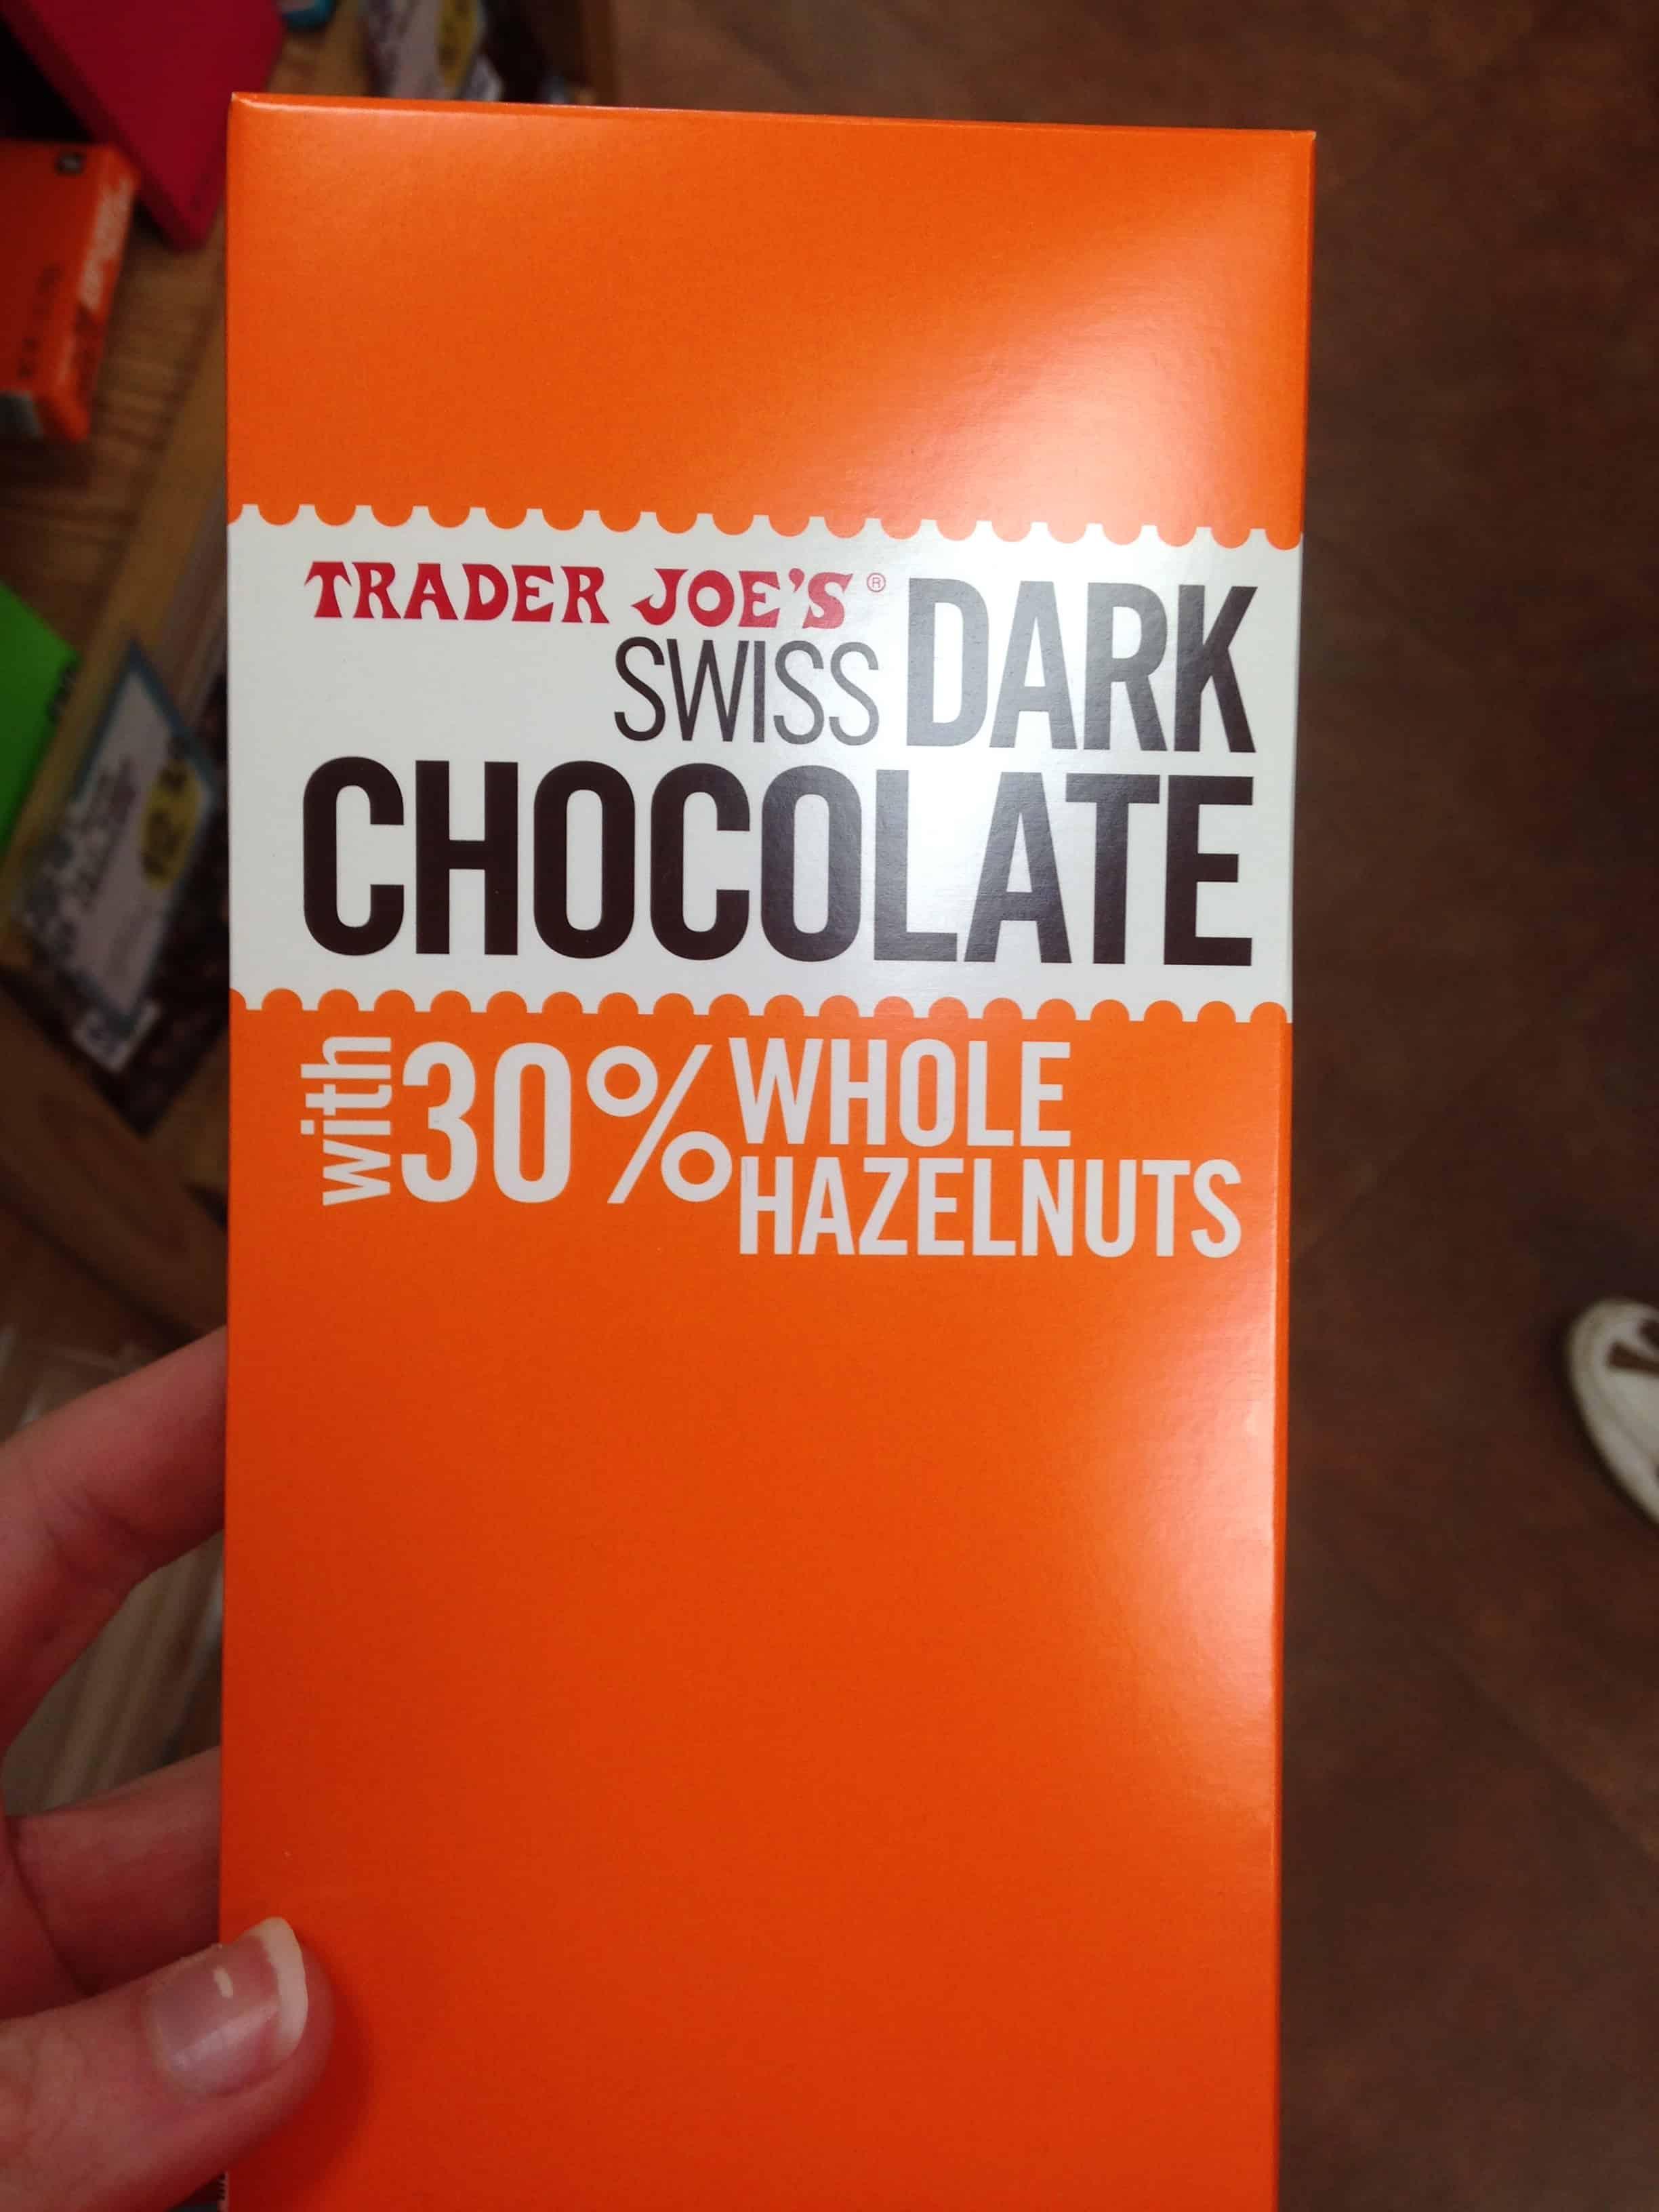 Swiss Dark Chocolate Trader Joes